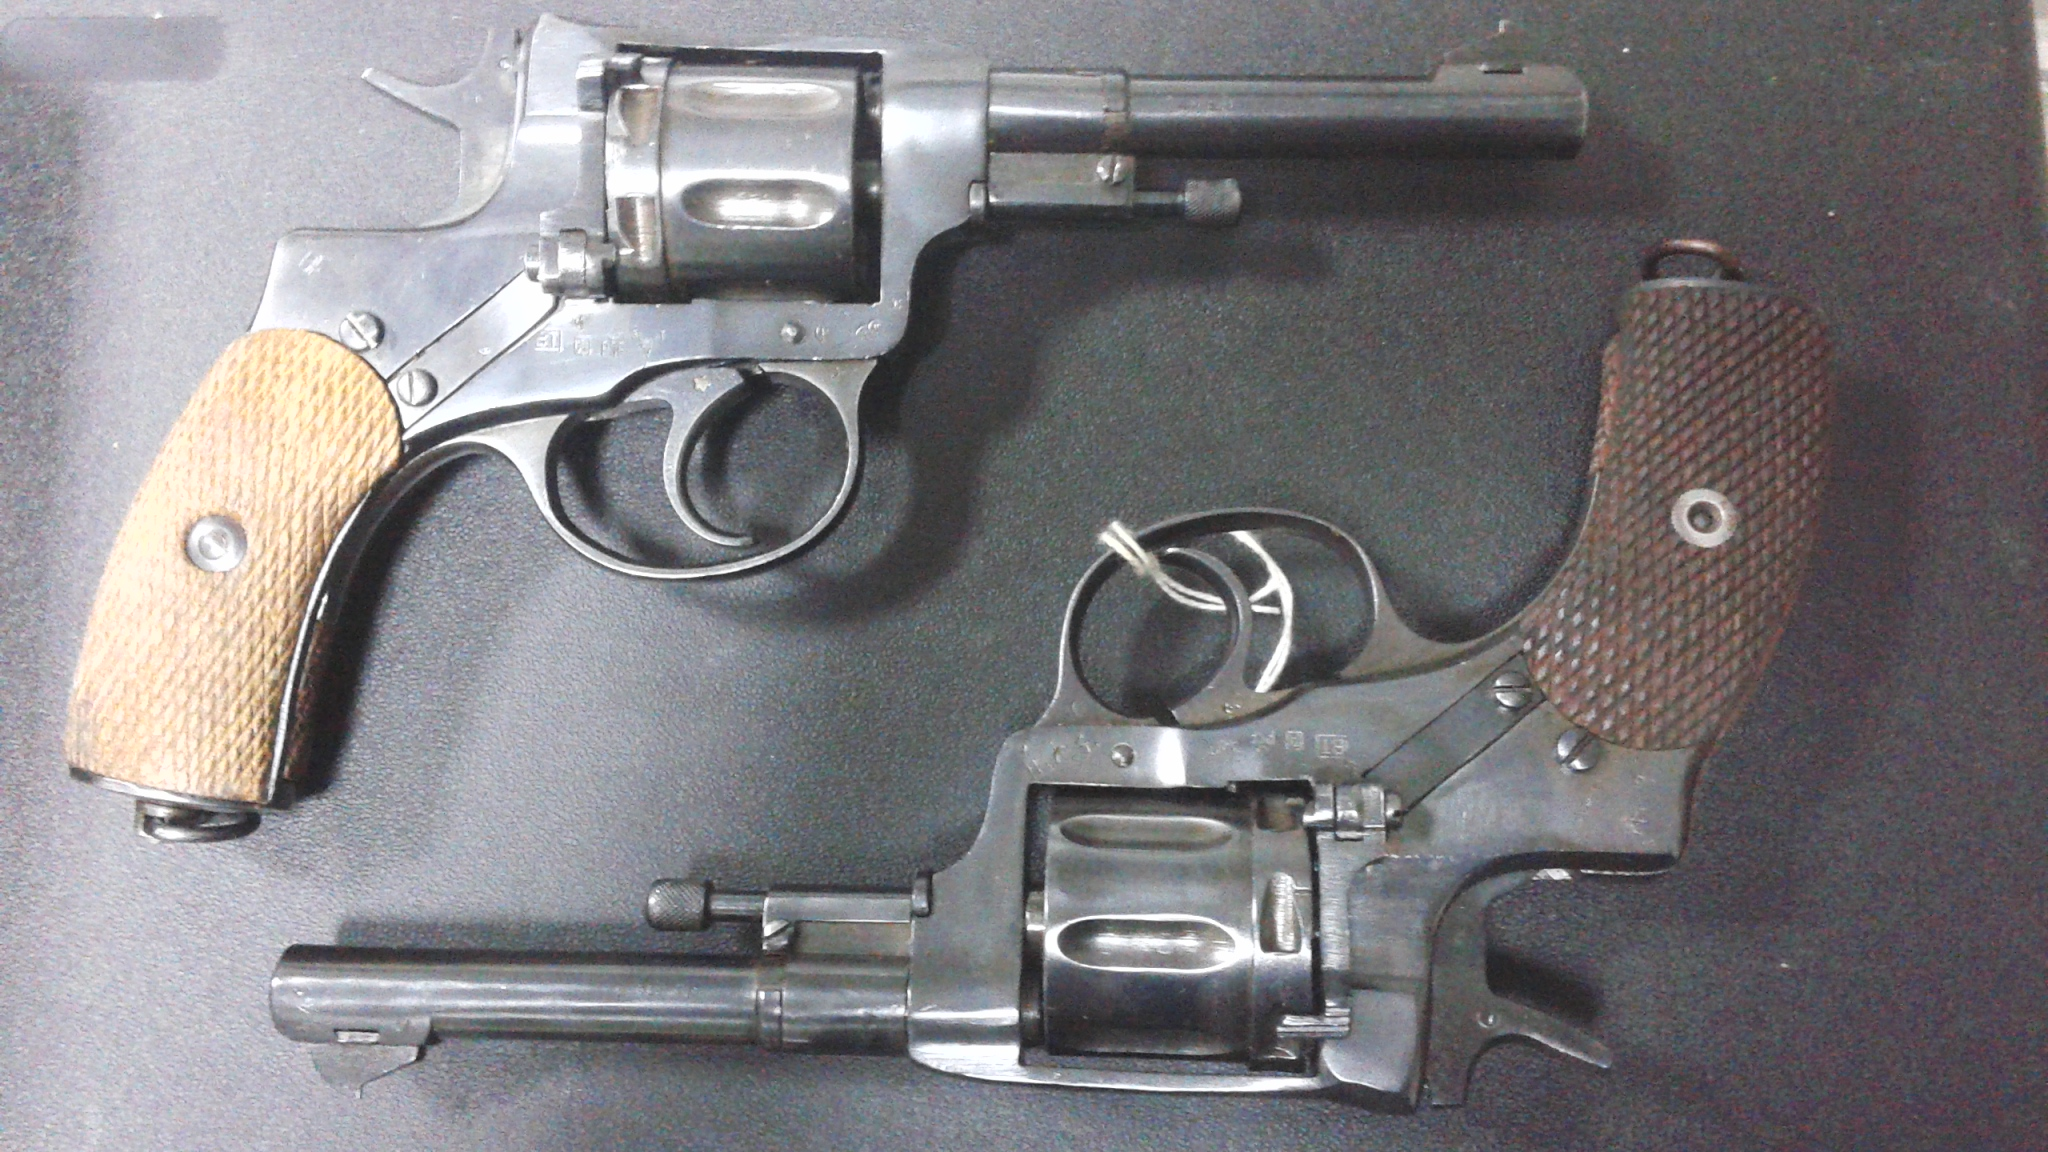 Nagant Revolvers mod.1895